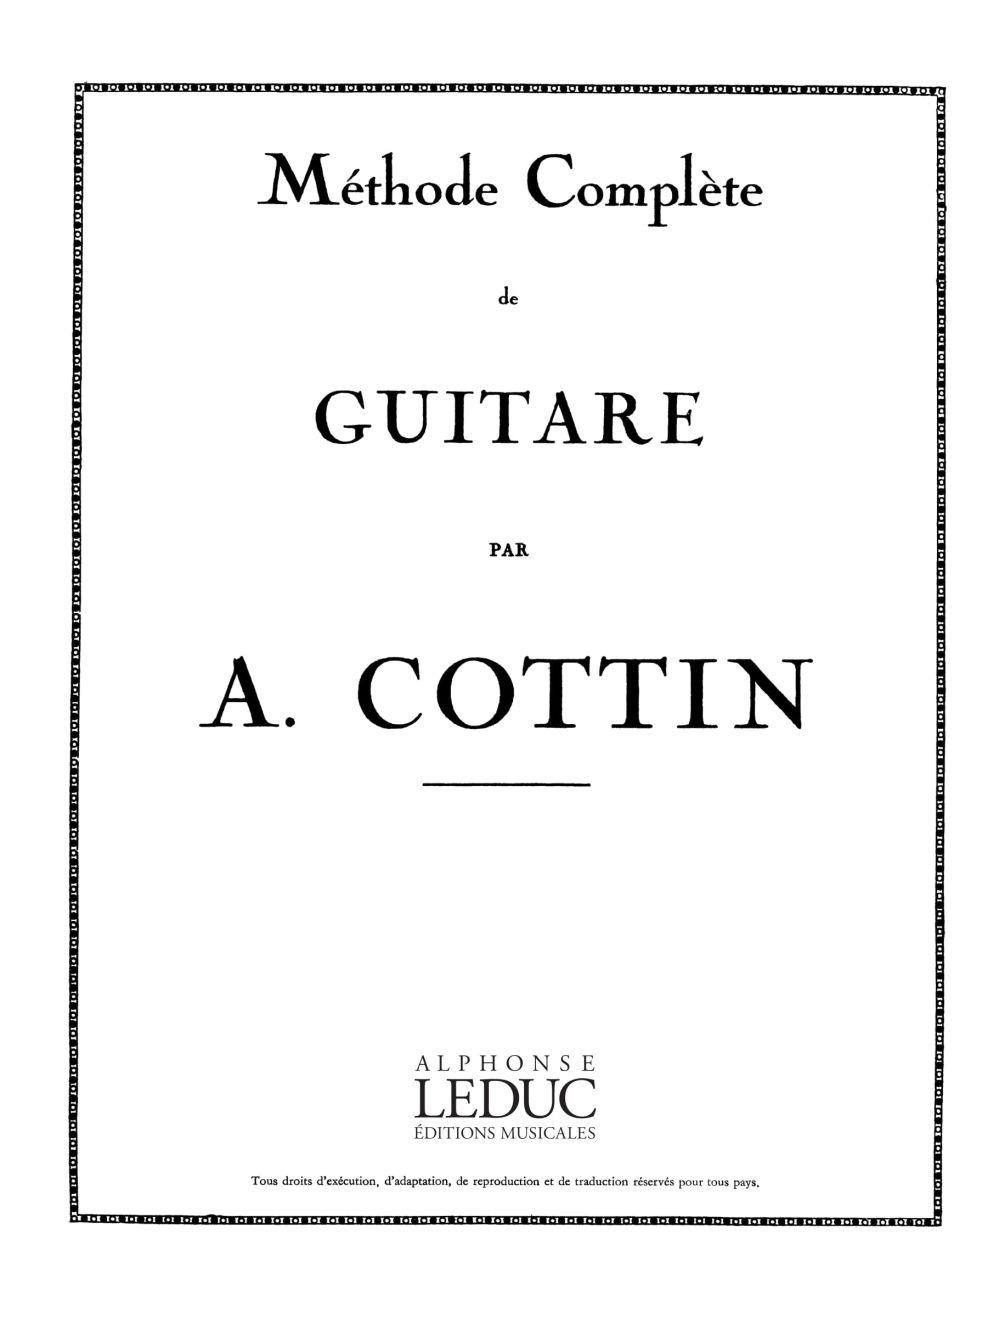 Cottin: Methode Complete: Guitar: Score